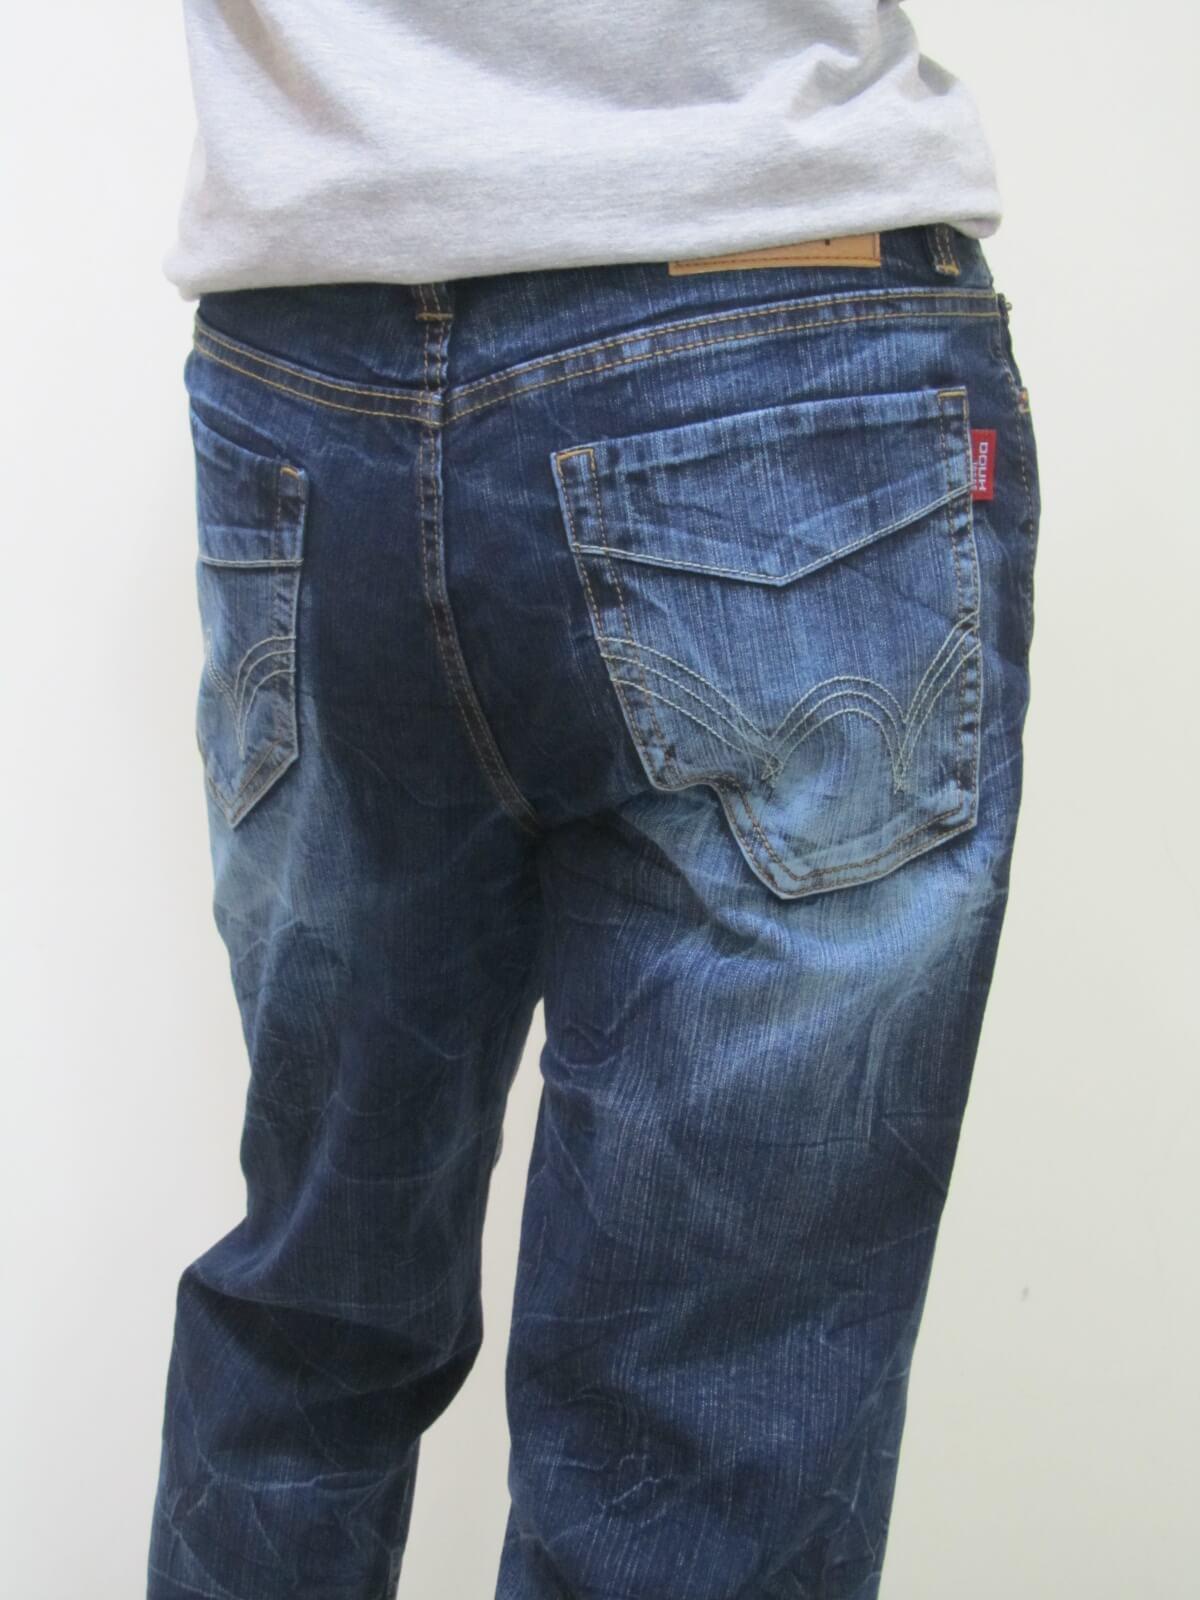 sun-e台灣製造牛仔長褲、伸縮直筒牛仔褲、台灣製單寧長褲(345-5876-31)深牛 腰圍:M L XL 2L 3L 4L (28~39)英吋 2